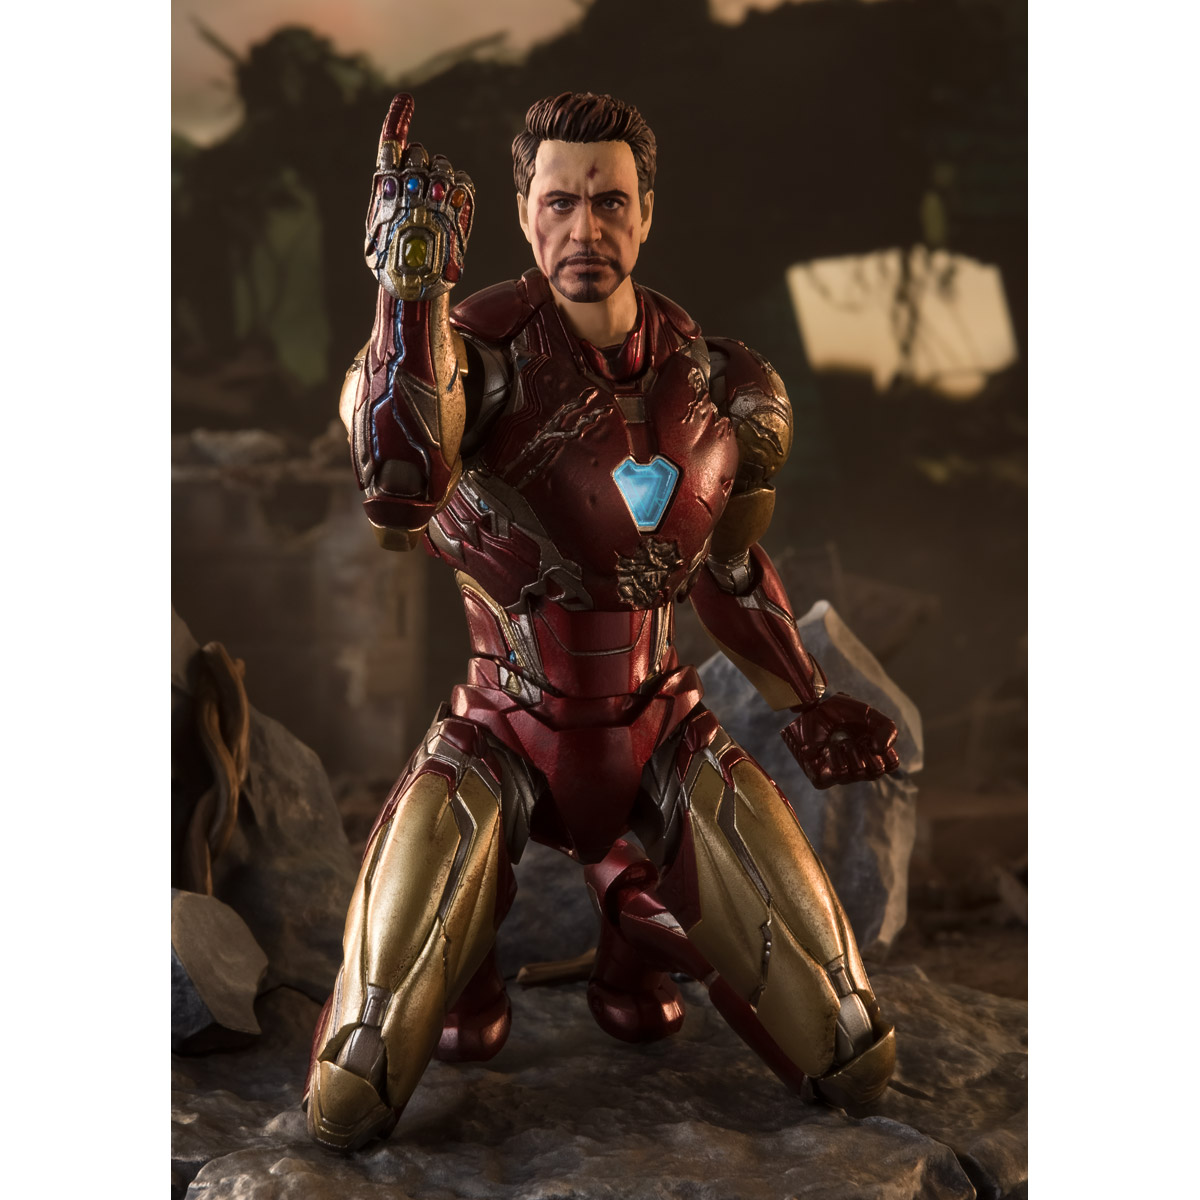 S.H.Figuarts Iron Man Mk-85 -《I AM IRON MAN》 EDITION (Avengers: Endgame)